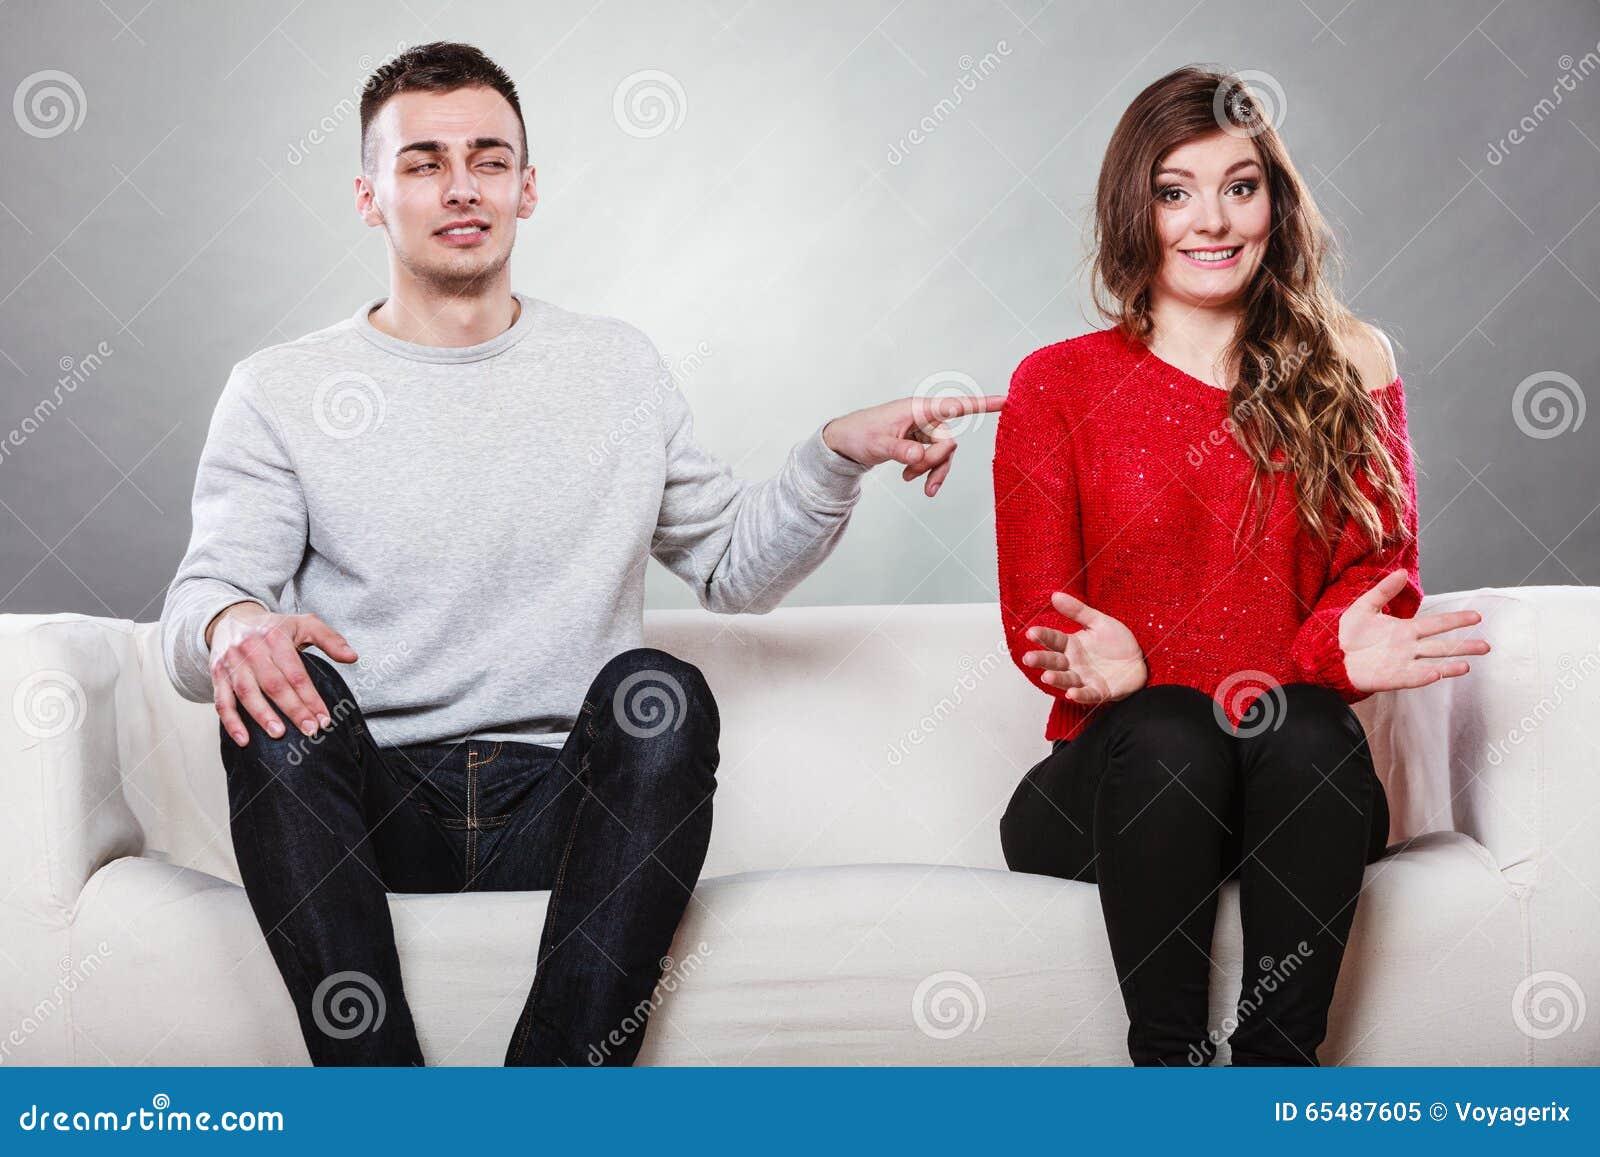 Mechanics dating